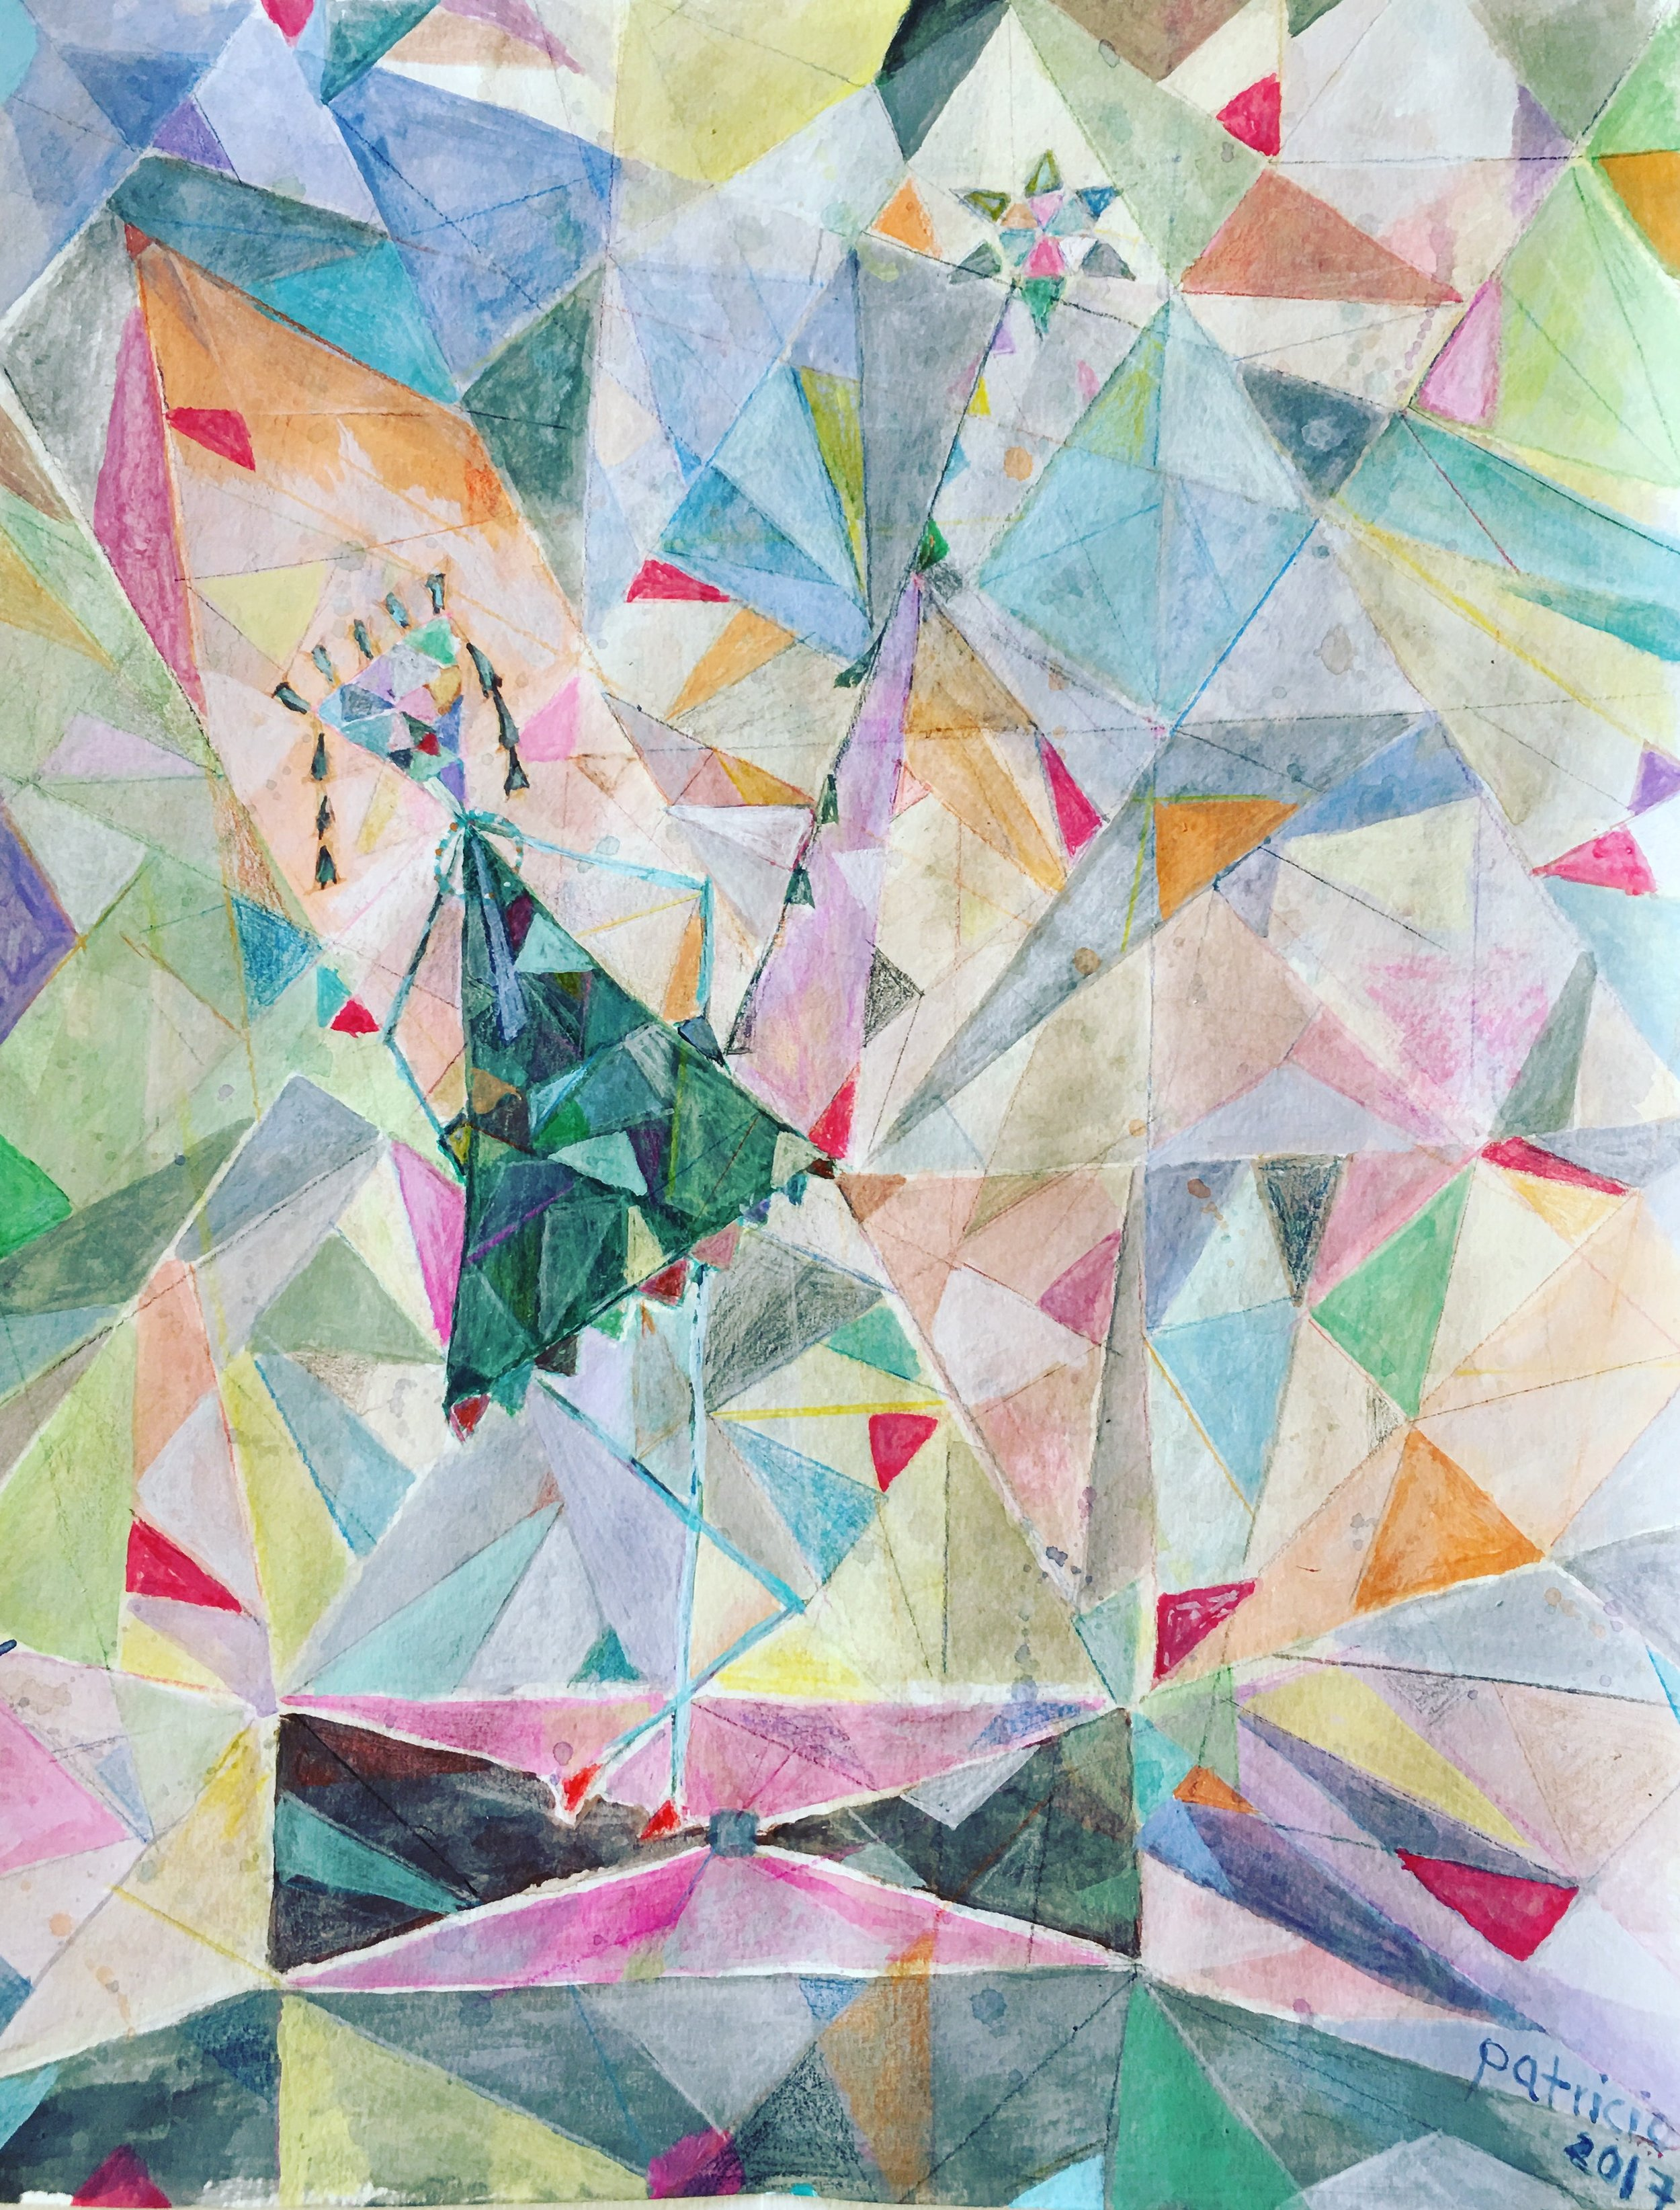 "MAMA Triangle  by Patricio Solis for VEGASMAMAS, 2017, 11"" x 14"", mixed media on paper"